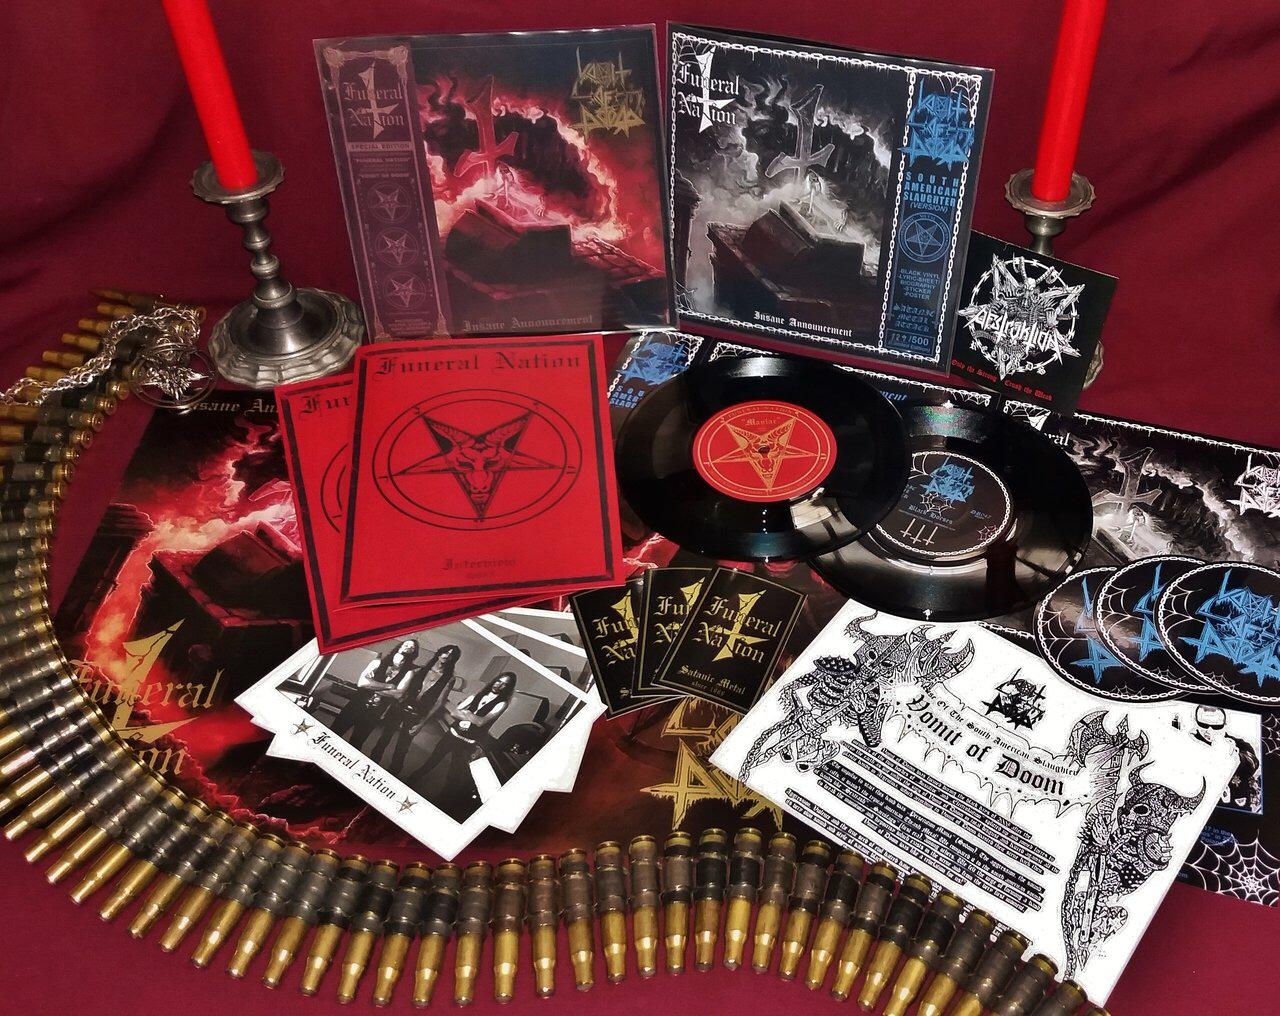 "FUNERAL NATION / VOMIT OF DOOM Split 7""EP"